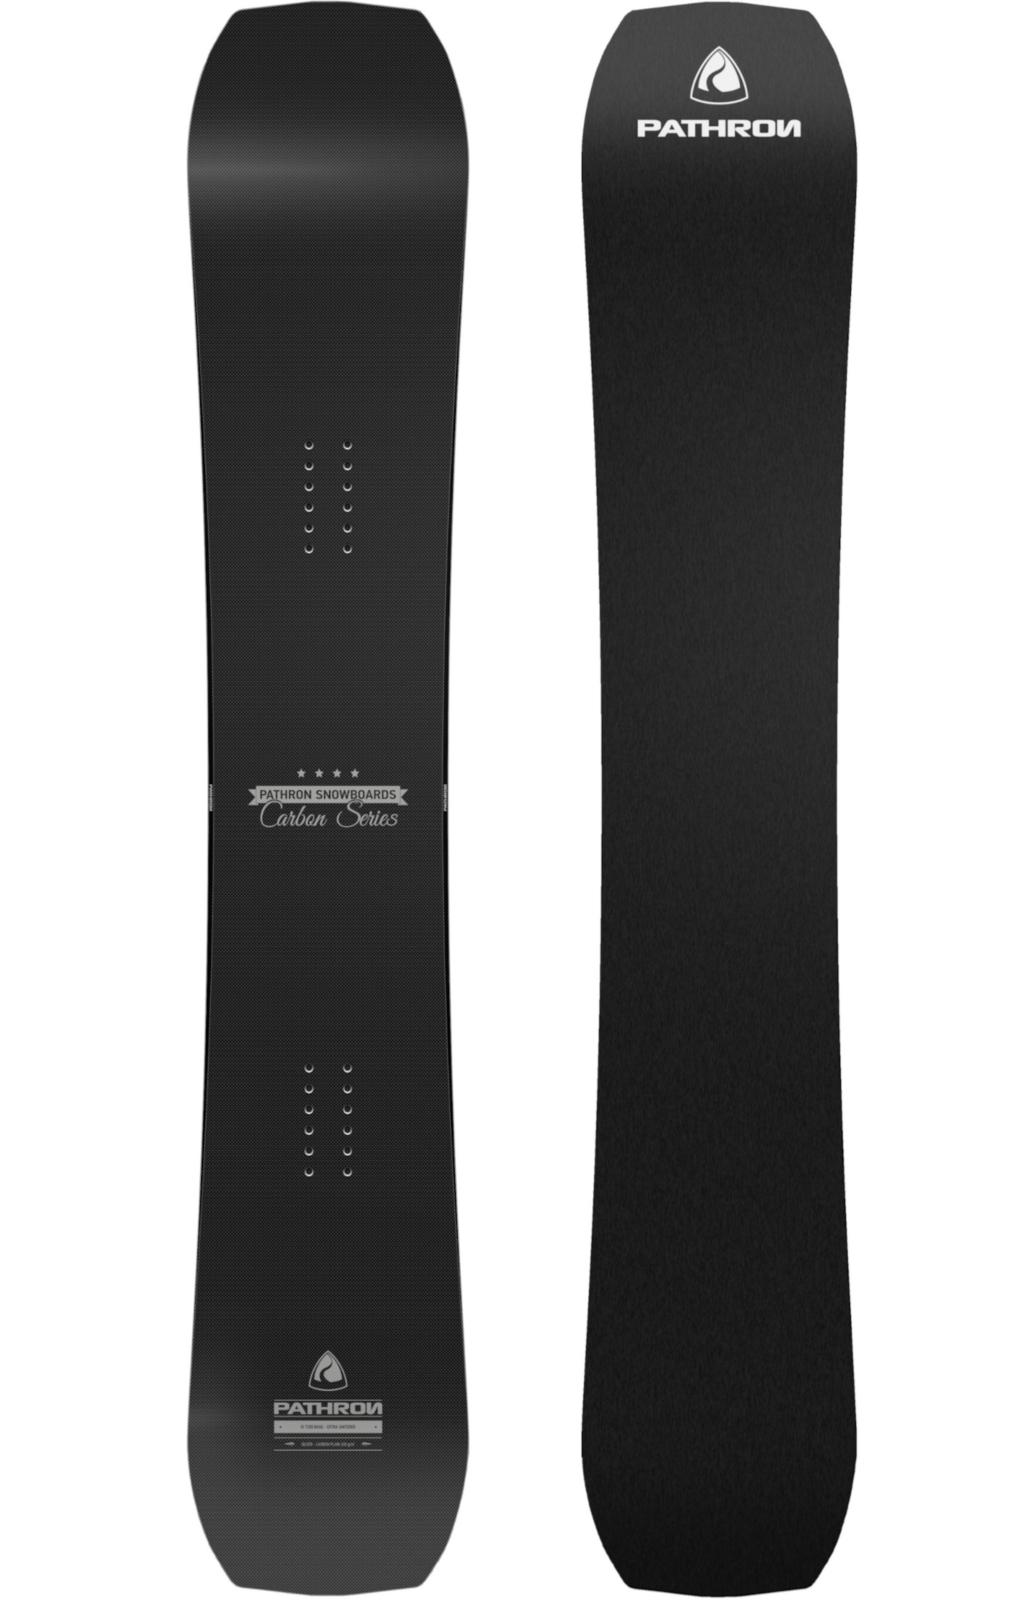 Deska snowboardowa Pathron Carbon Silver 2018/2019 165cm Wide